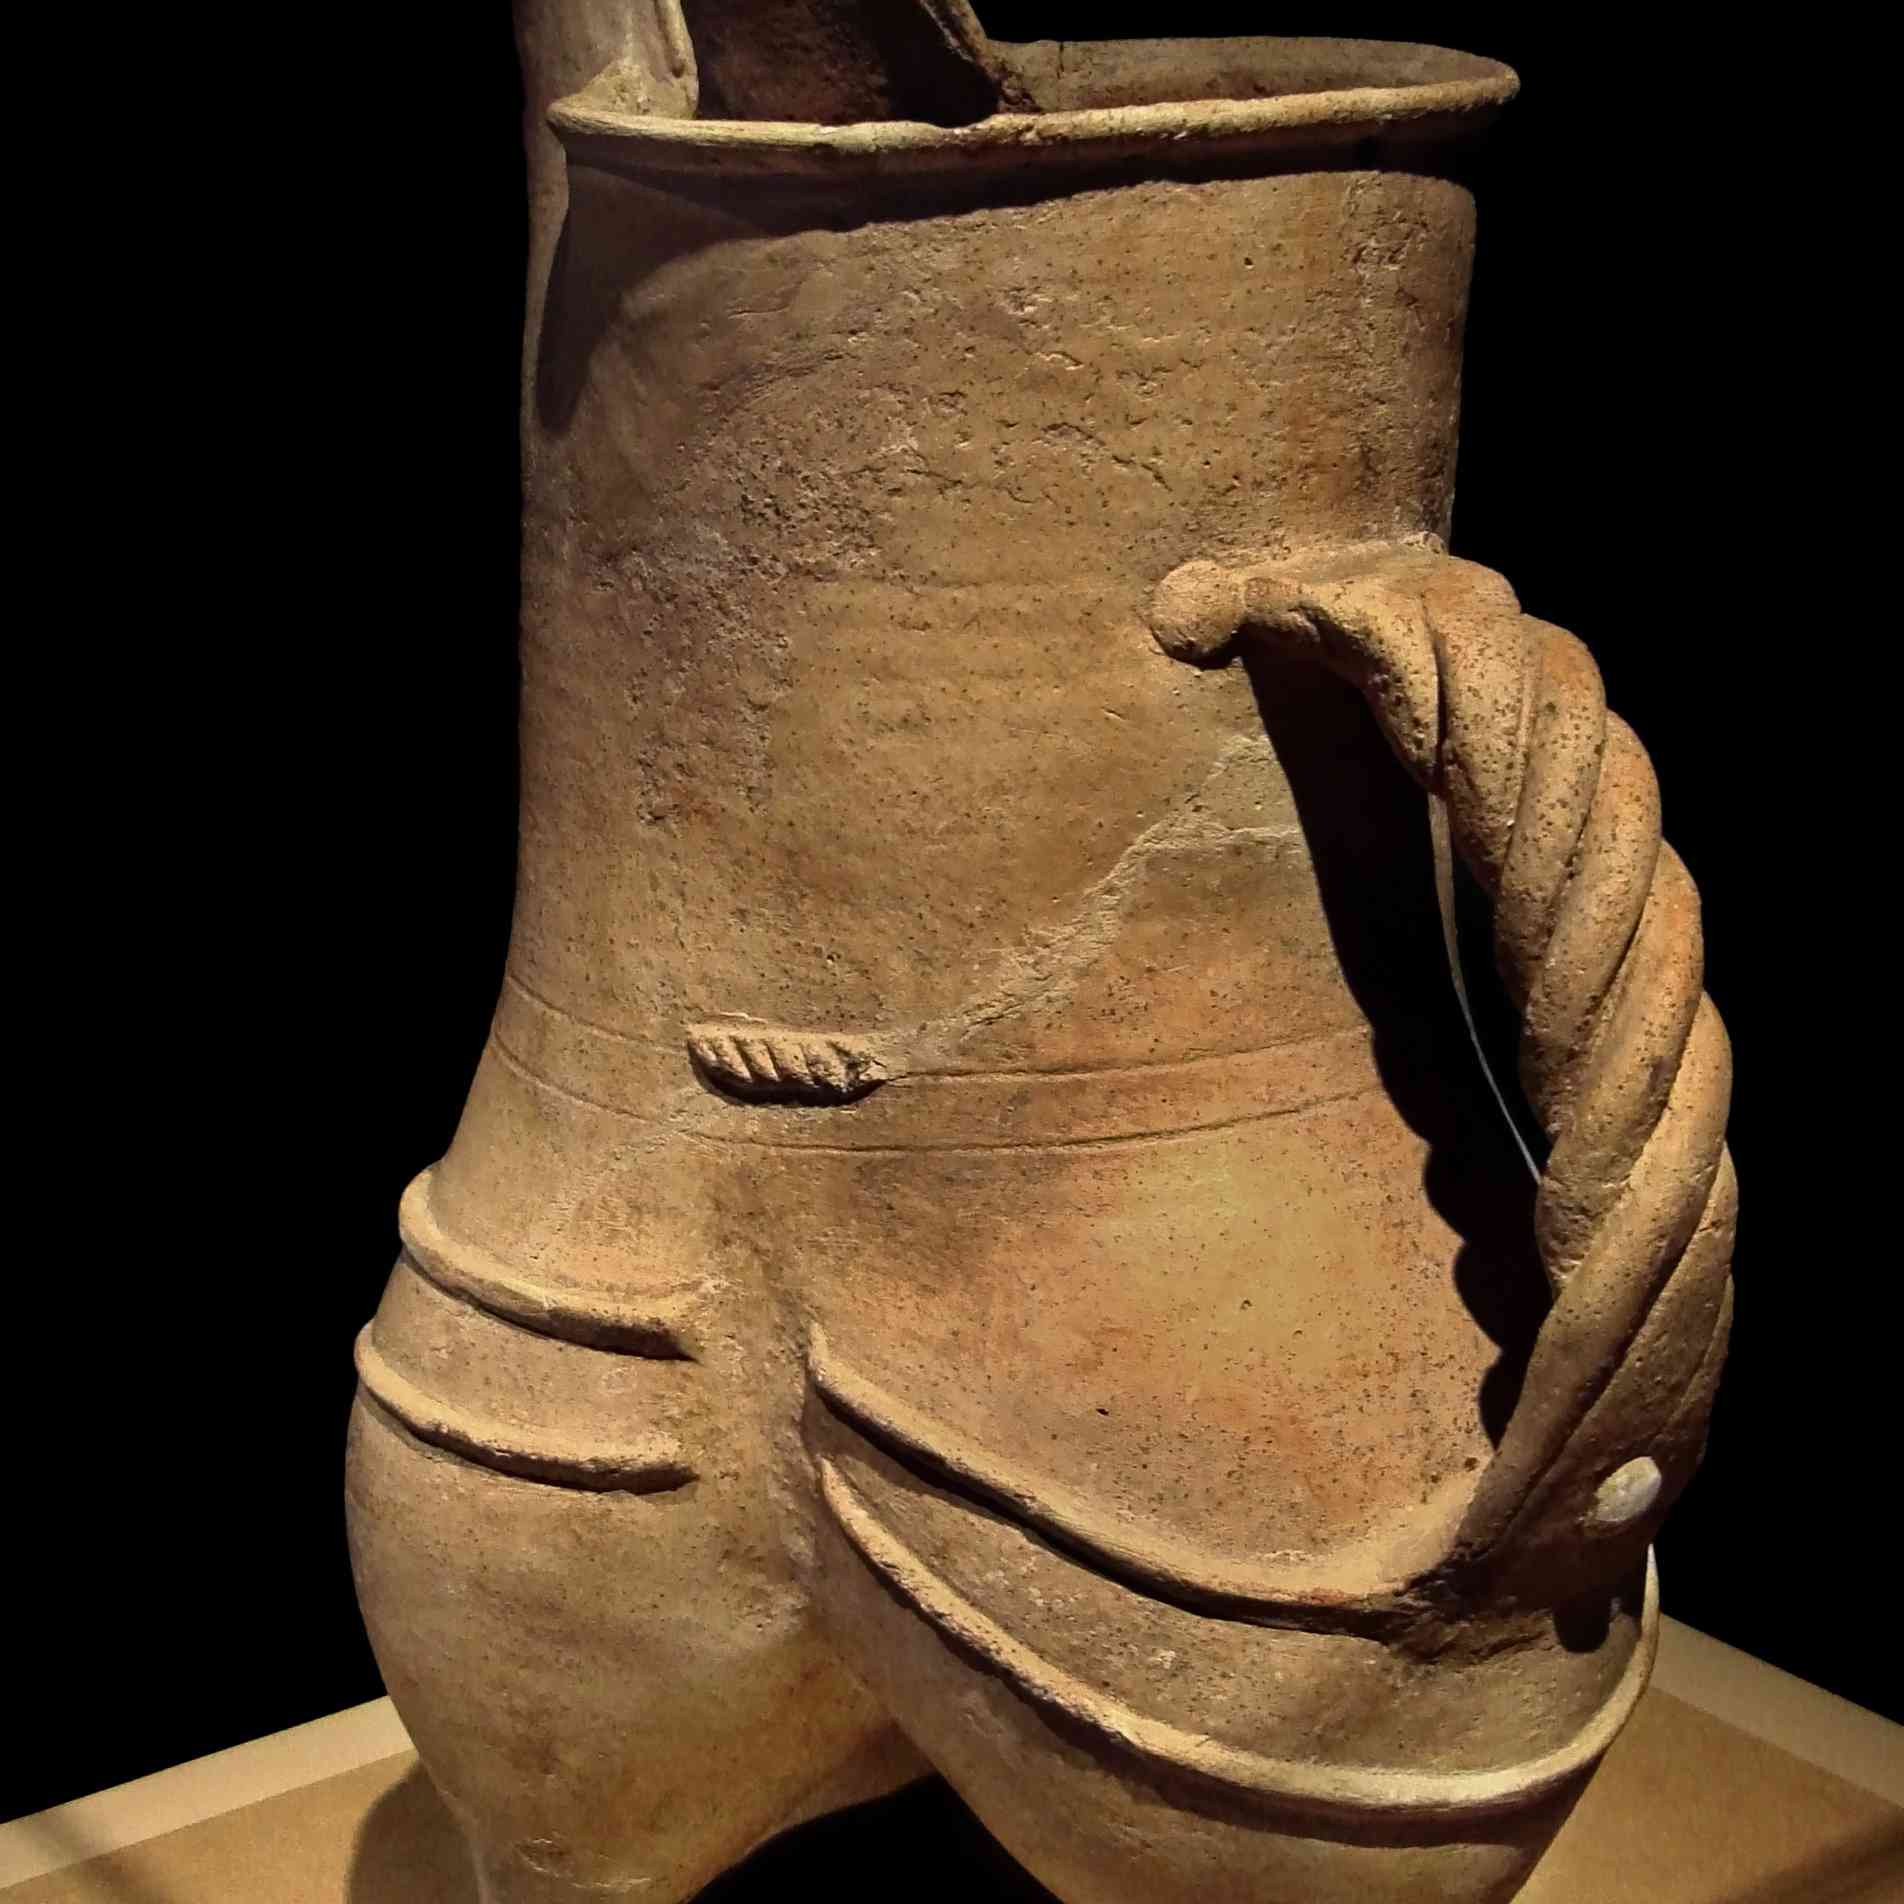 White Pottery Gui, Longshan Culture, Rizhao, Shandong Province